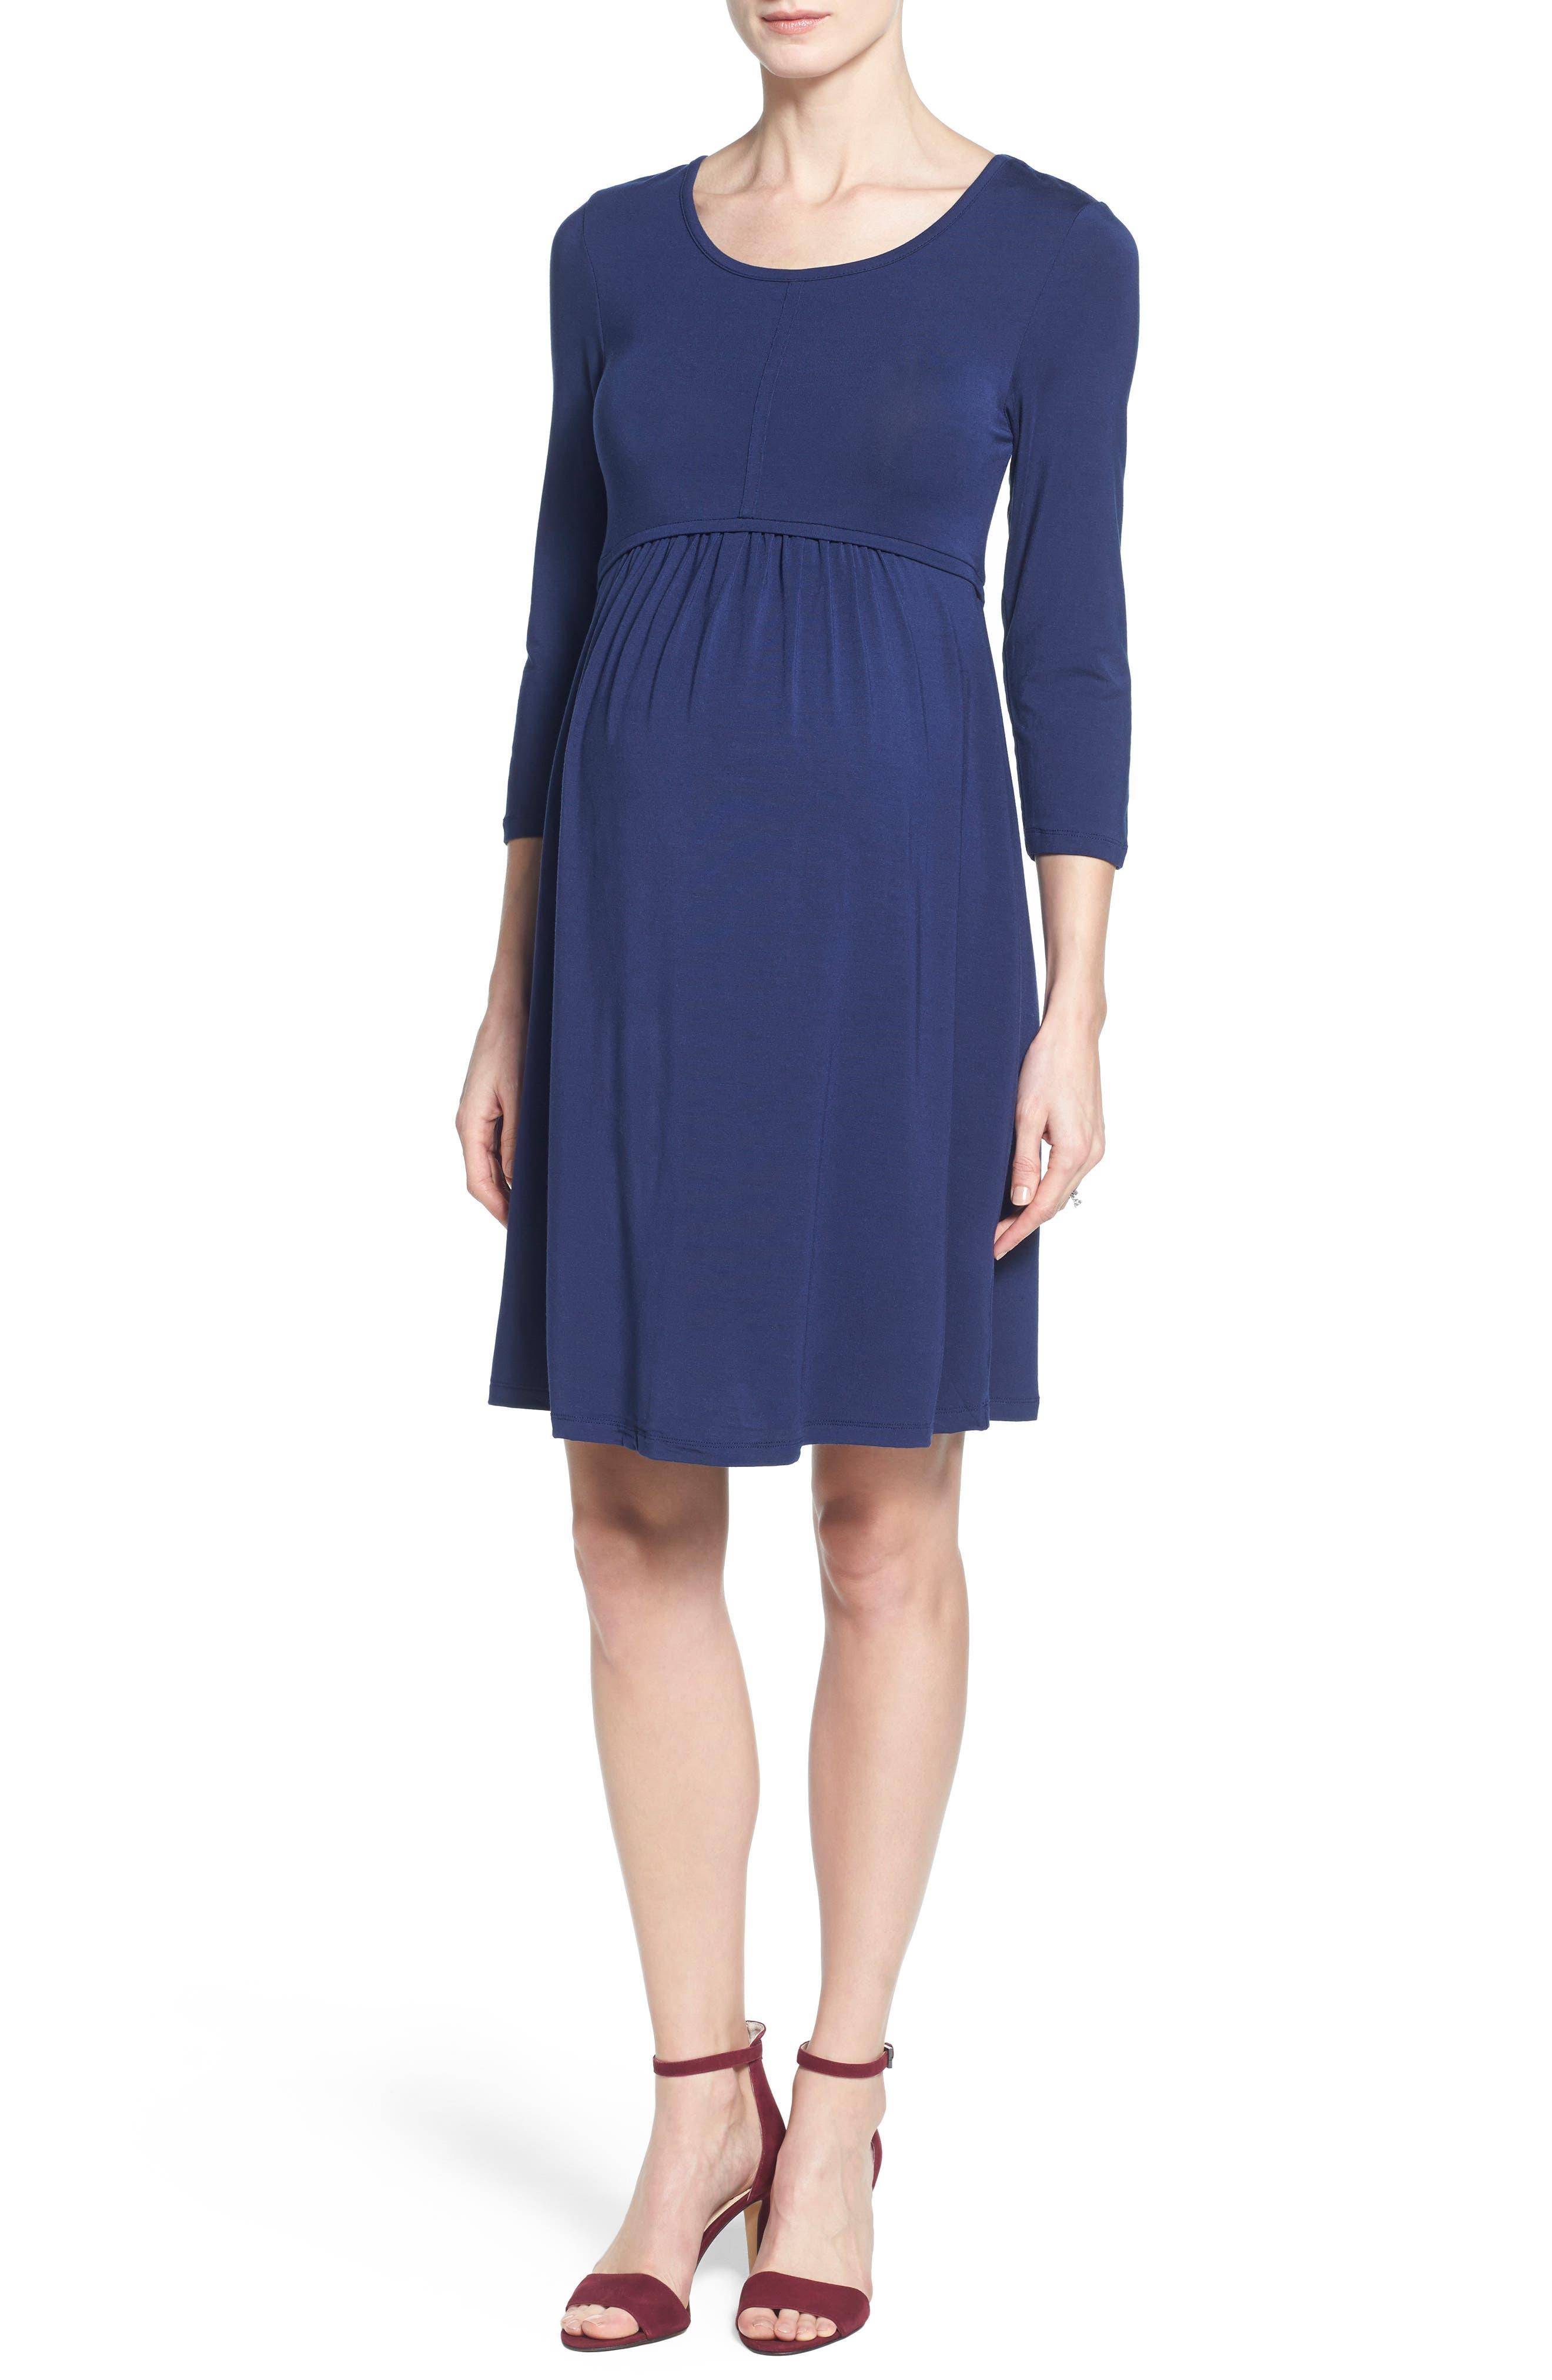 TART MATERNITY 'Mathilde' Elbow Sleeve Maternity Dress, Main, color, PEACOAT